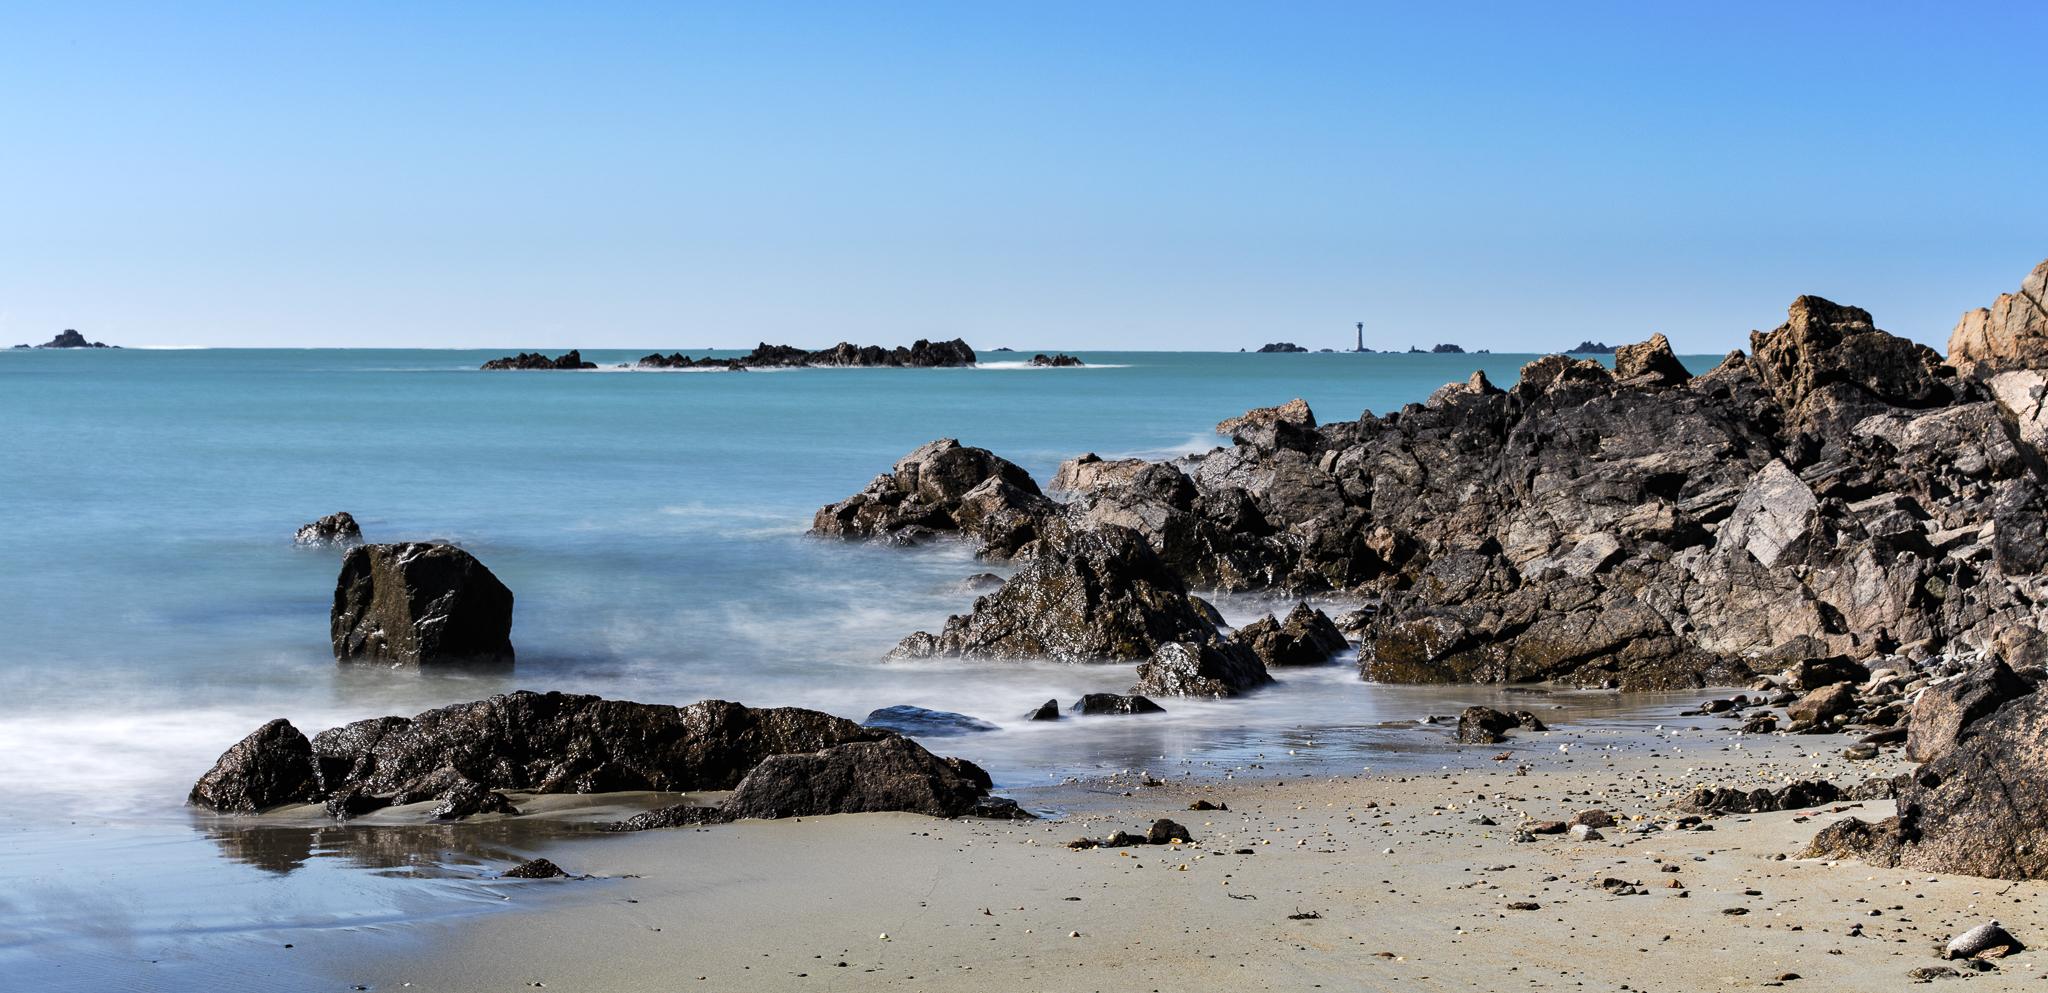 Coast near Lihou island, L'Erée, Guernsey, United Kingdom